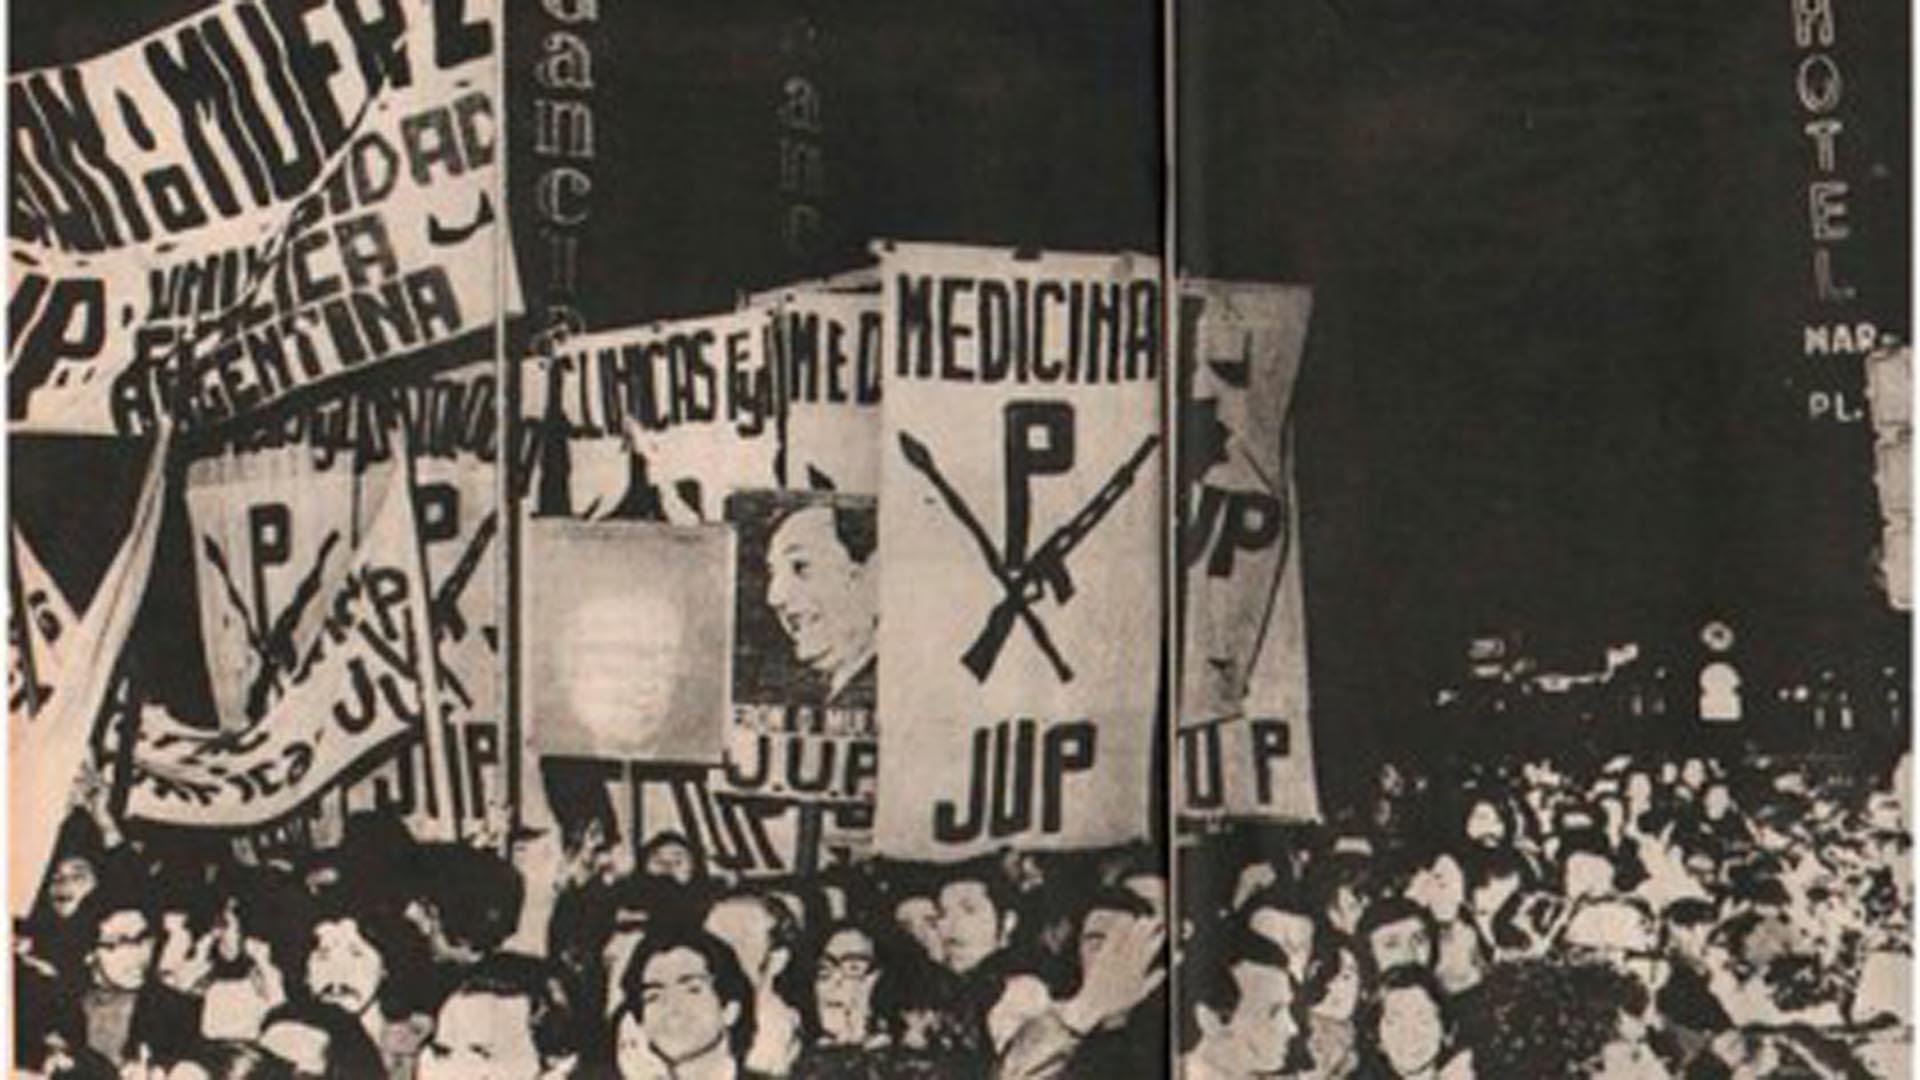 Juventud Universitaria Peronista – Medicina (JUP)